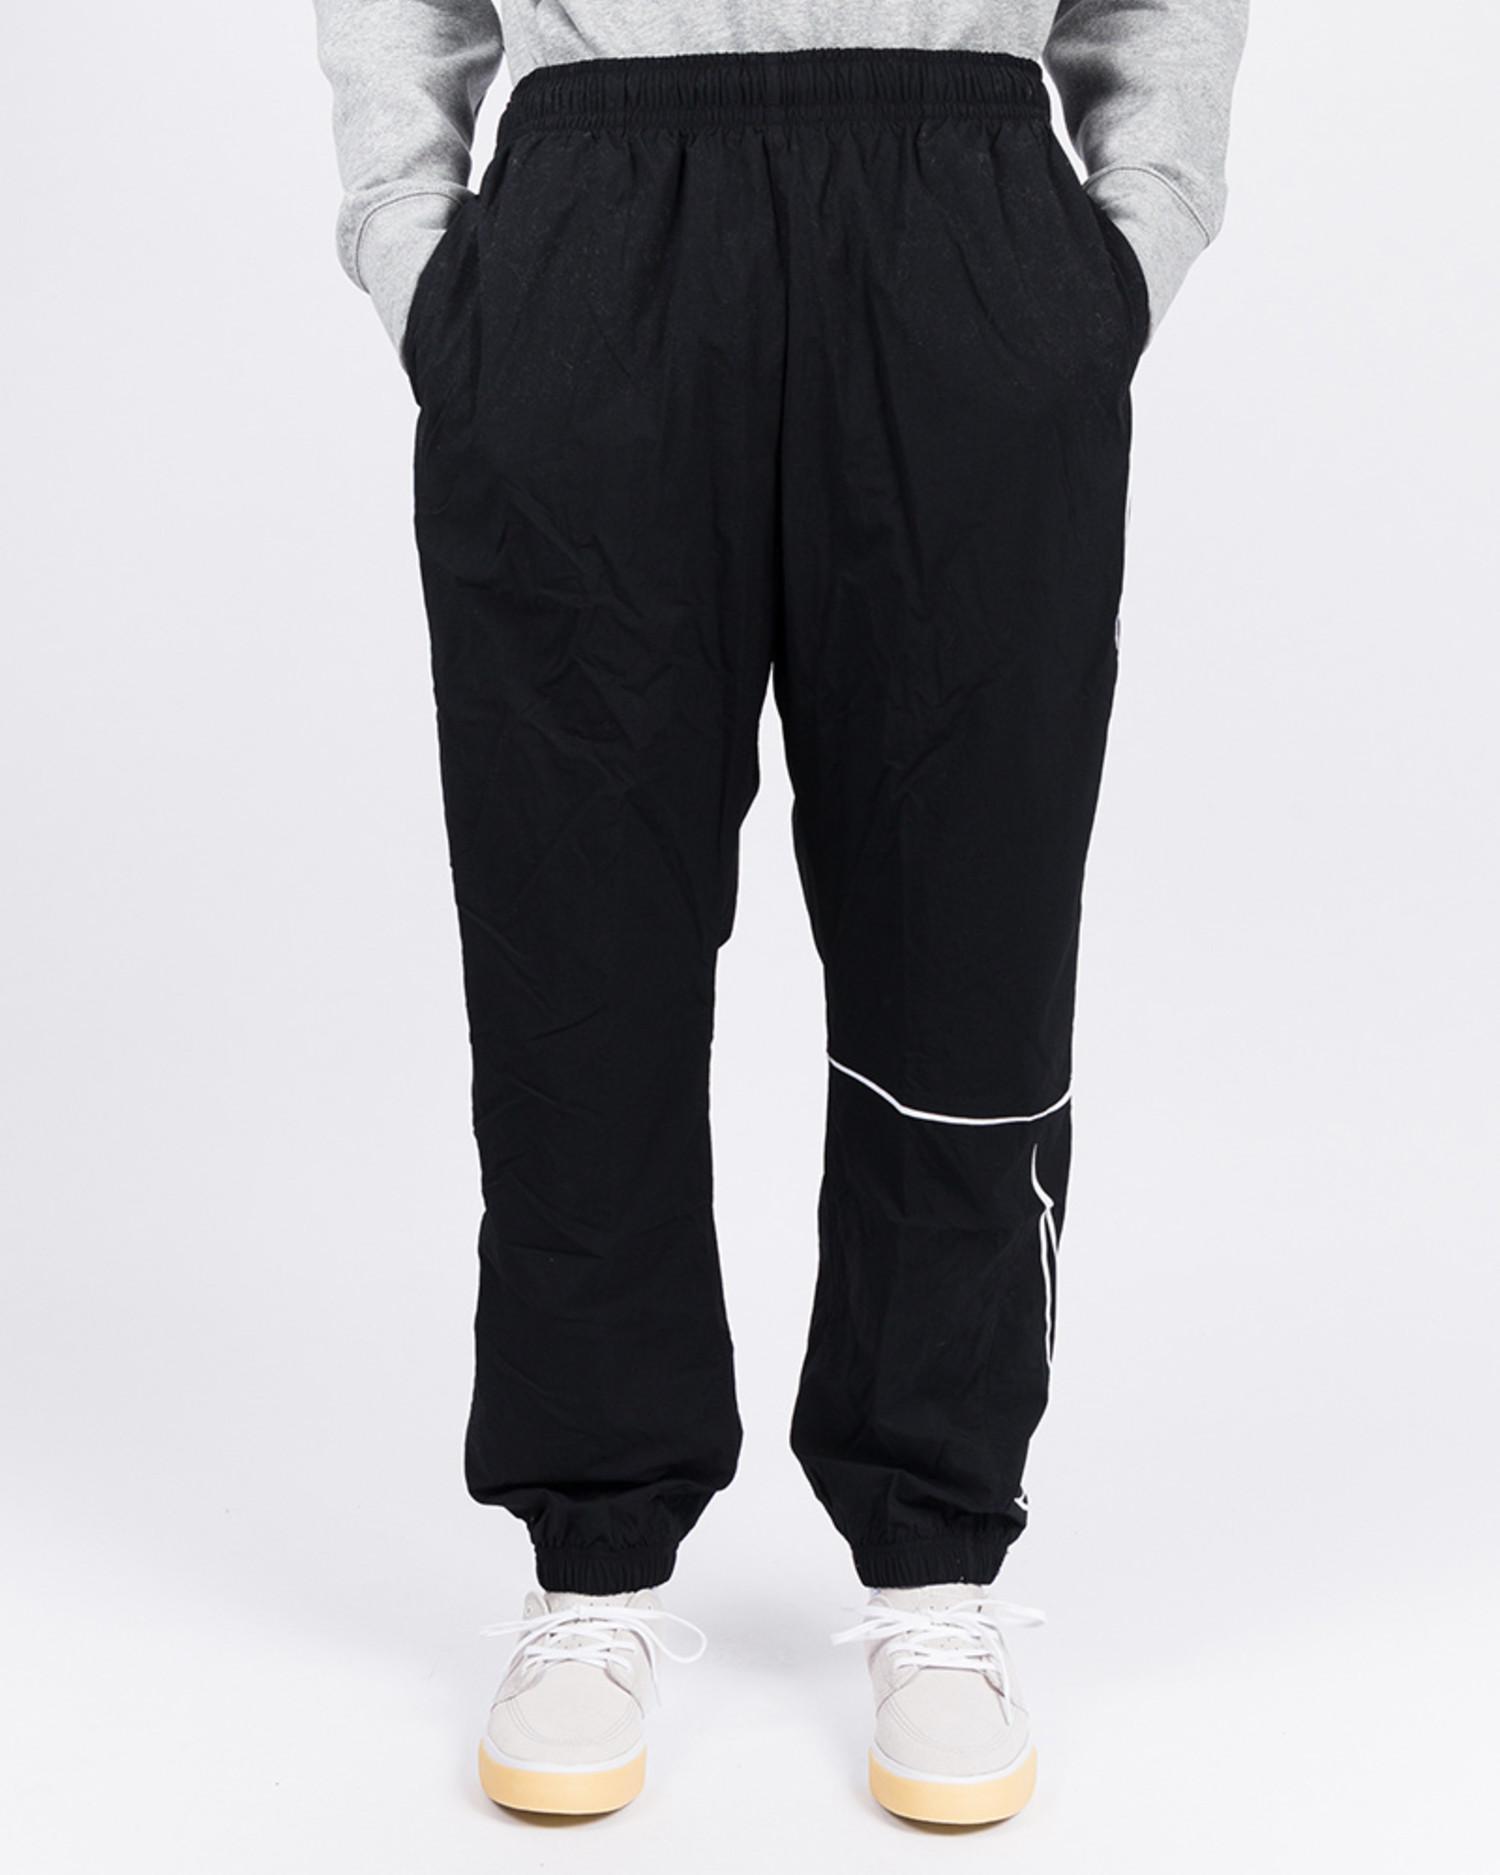 Nike SB Track Pants Black/White XL